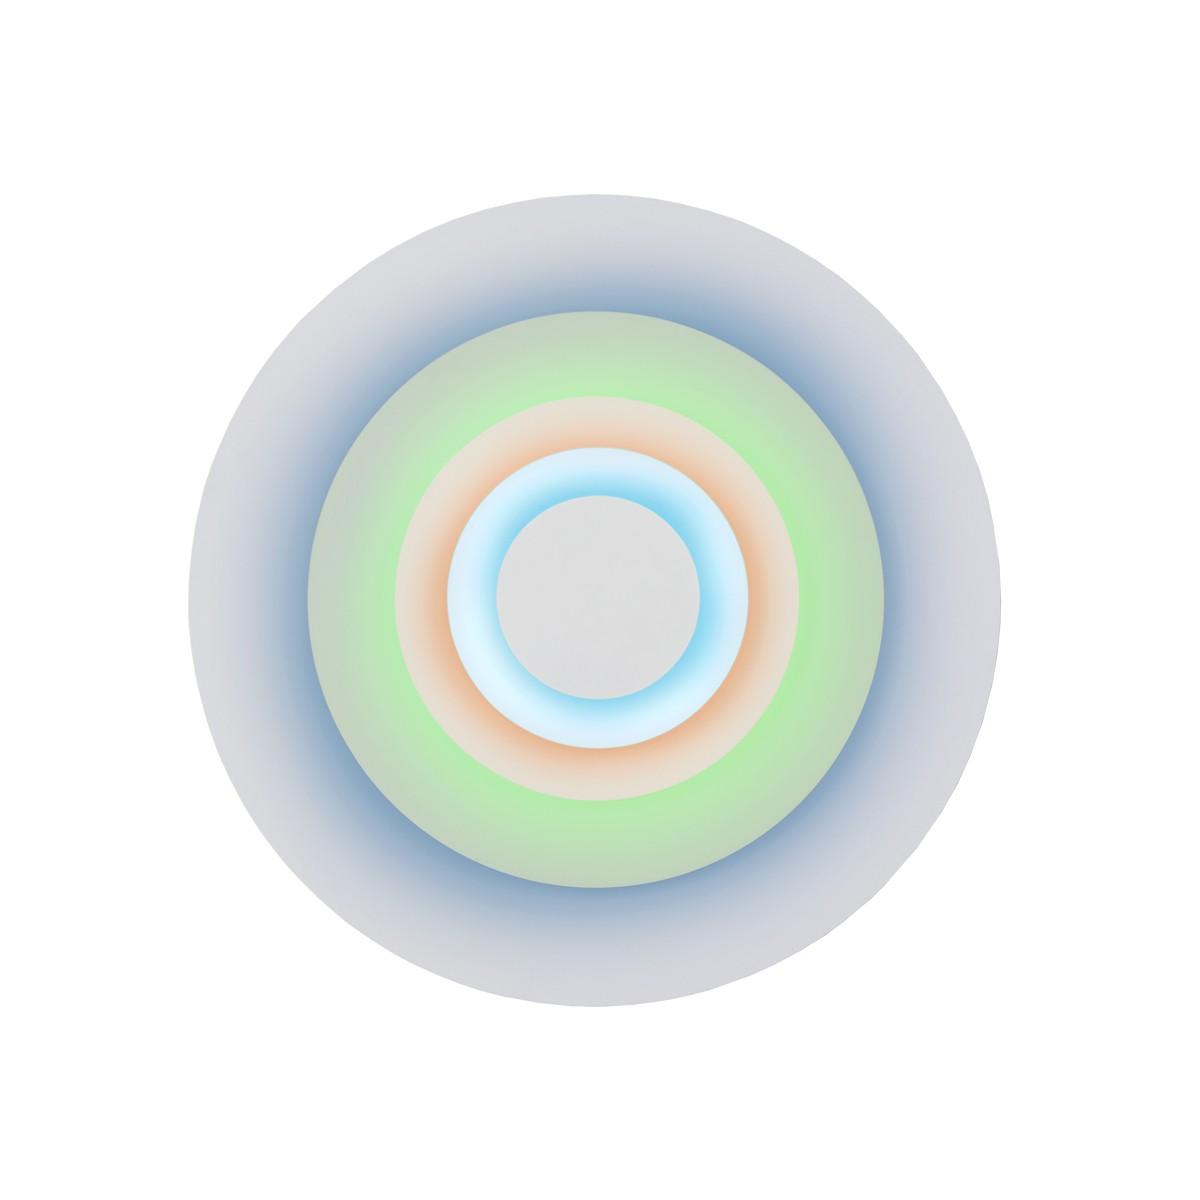 Marset Concentric M Wandleuchte, Minor (blau/braun/mint)